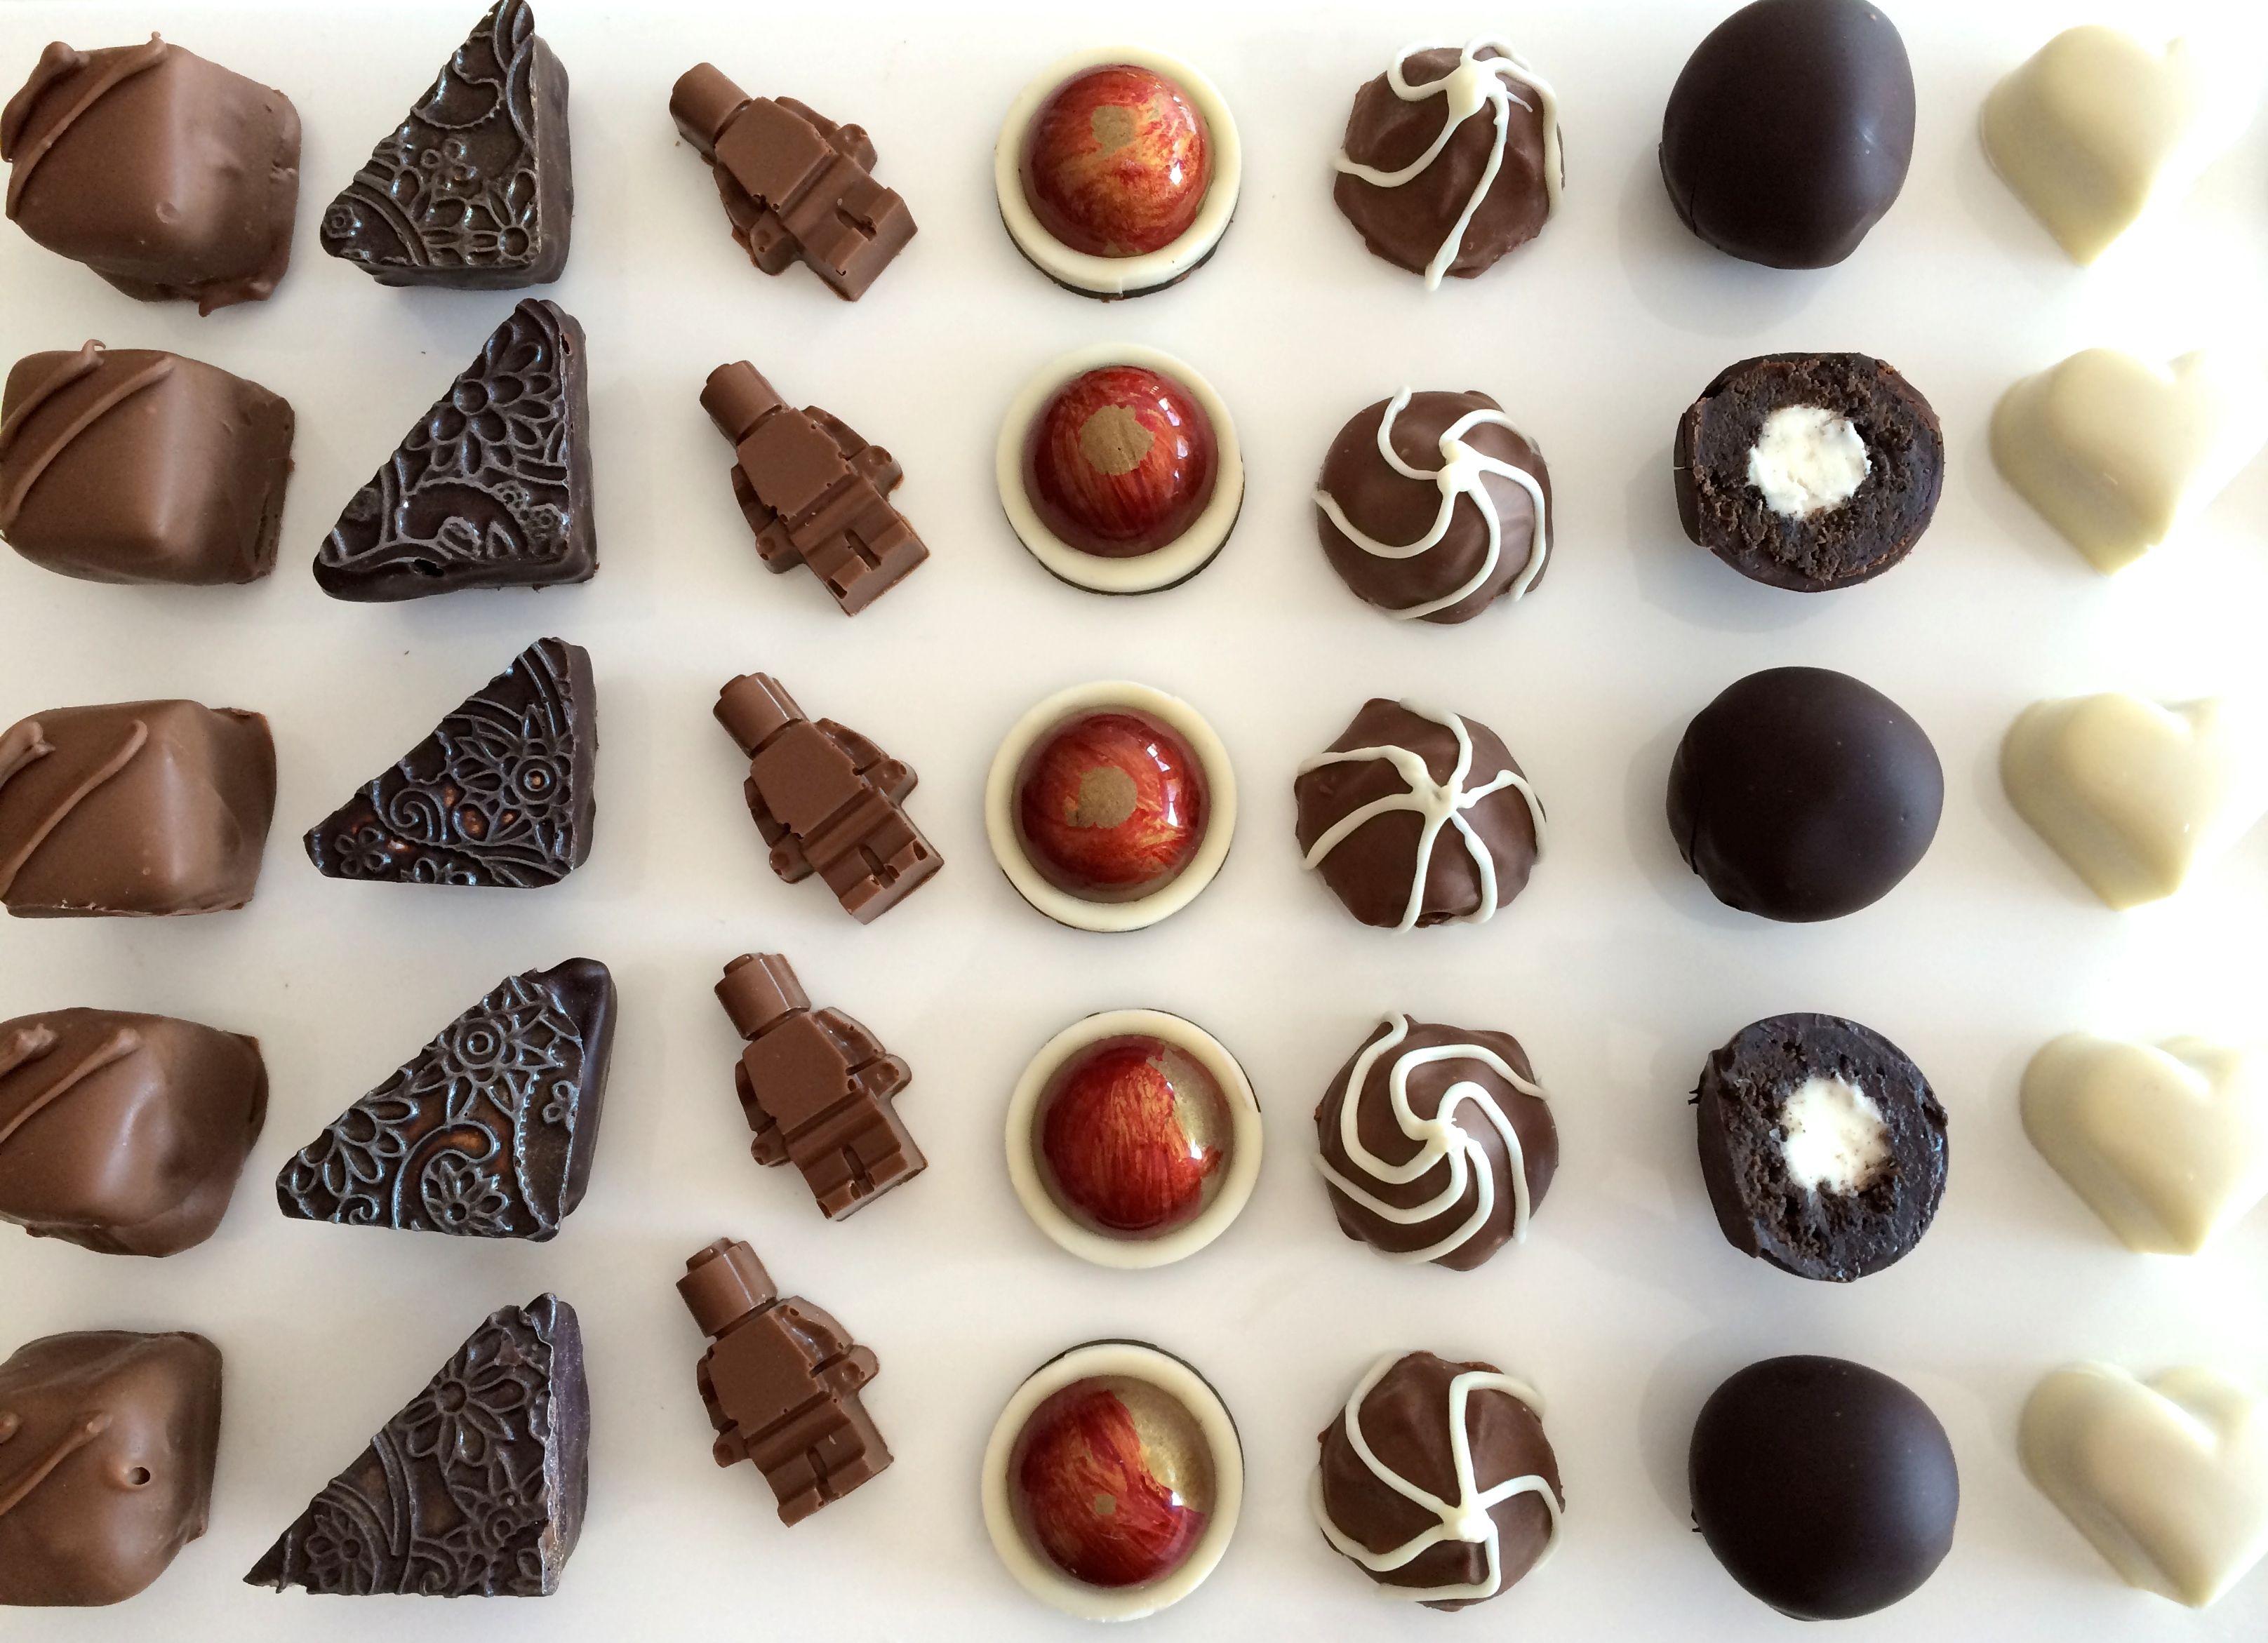 10 Chocolate truffles | Chocolates | Pinterest | Chocolate ...